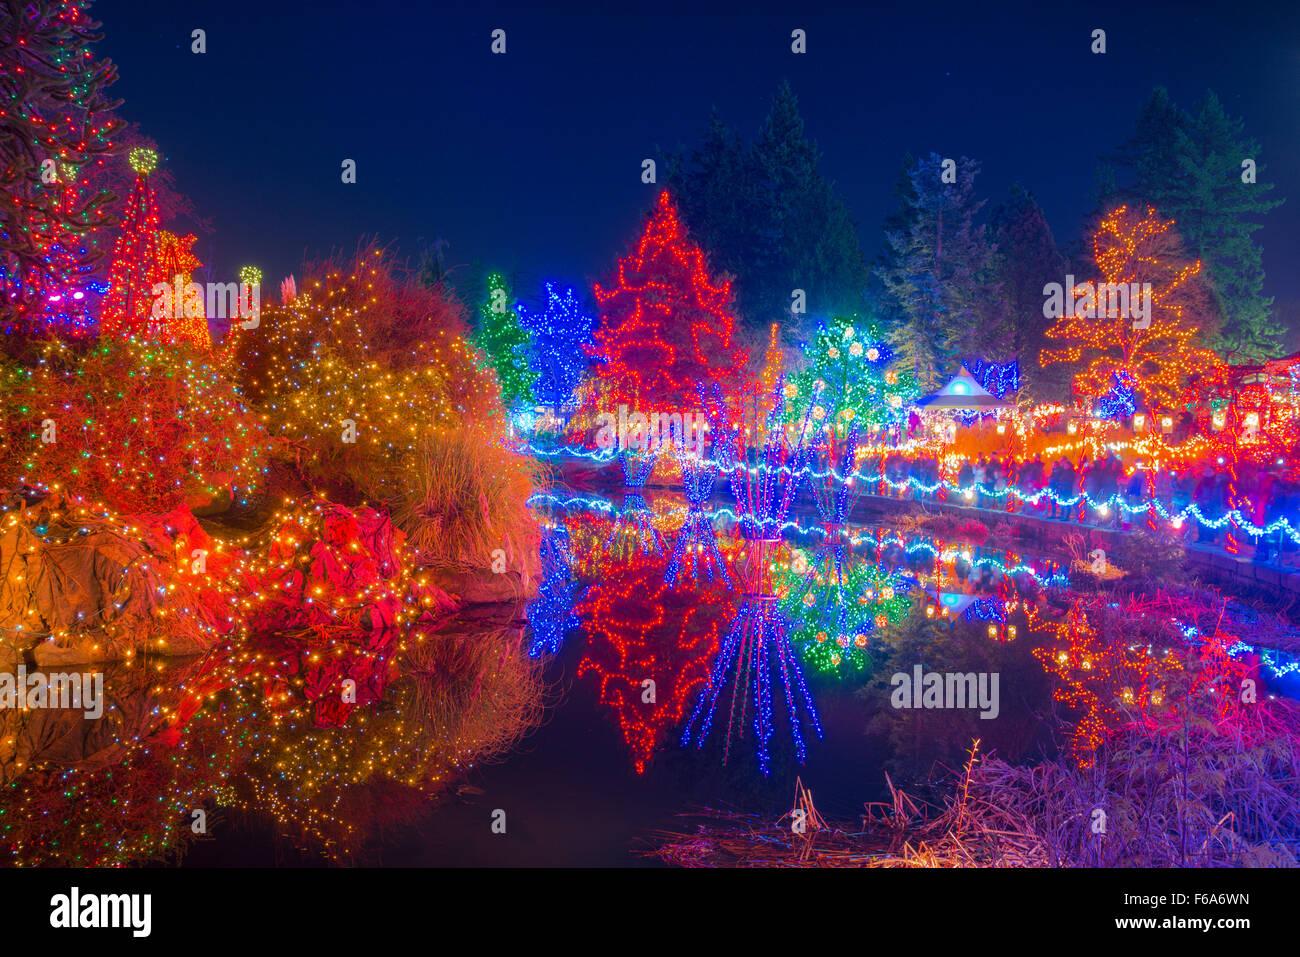 Festival of Lights, VanDusen Botanical Garden, Vancouver, British Columbia, Canada - Stock Image